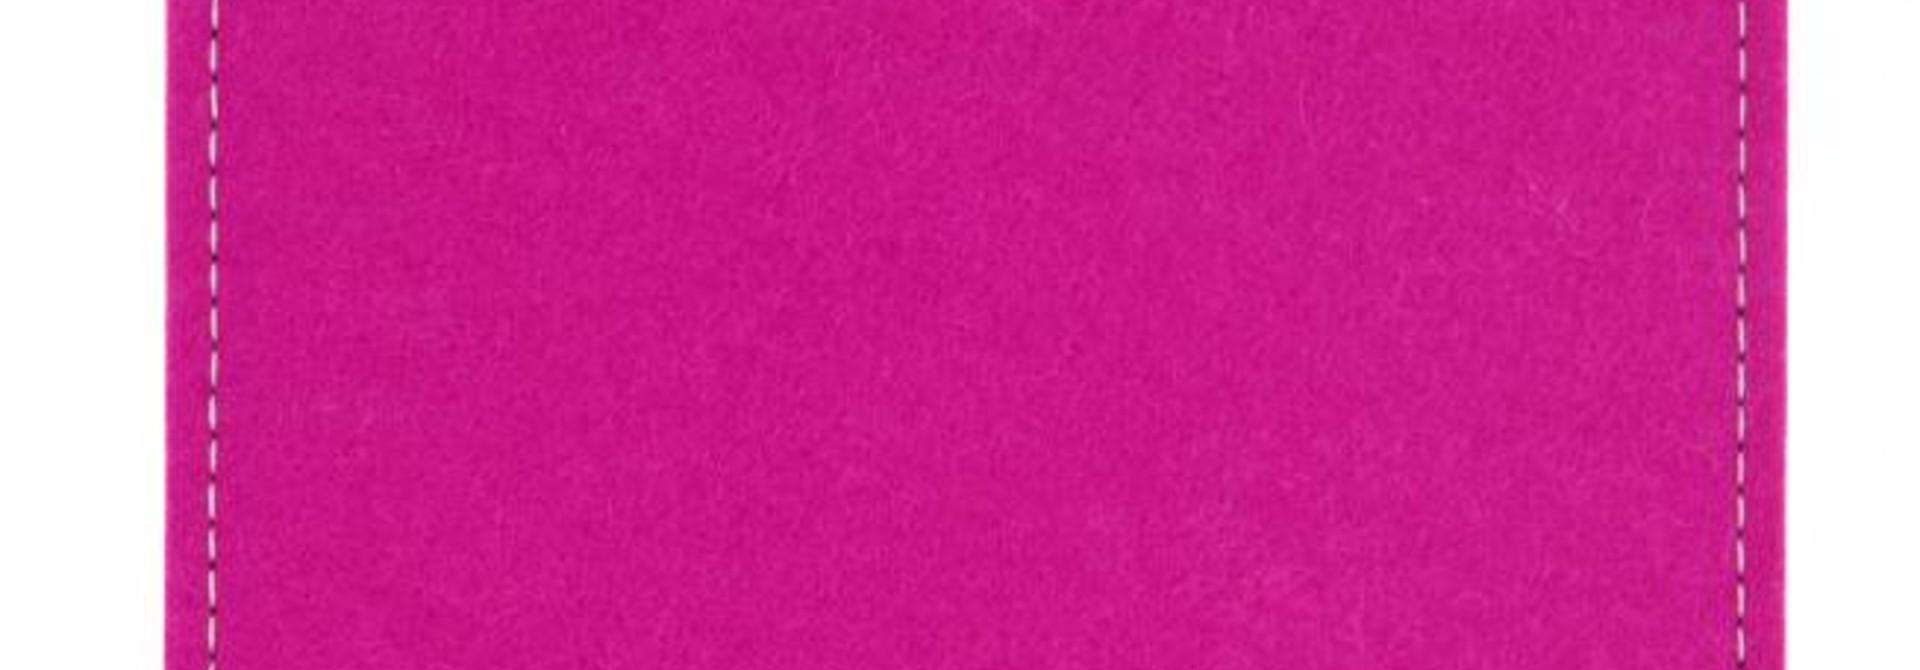 Galaxy Tablet Sleeve Pink